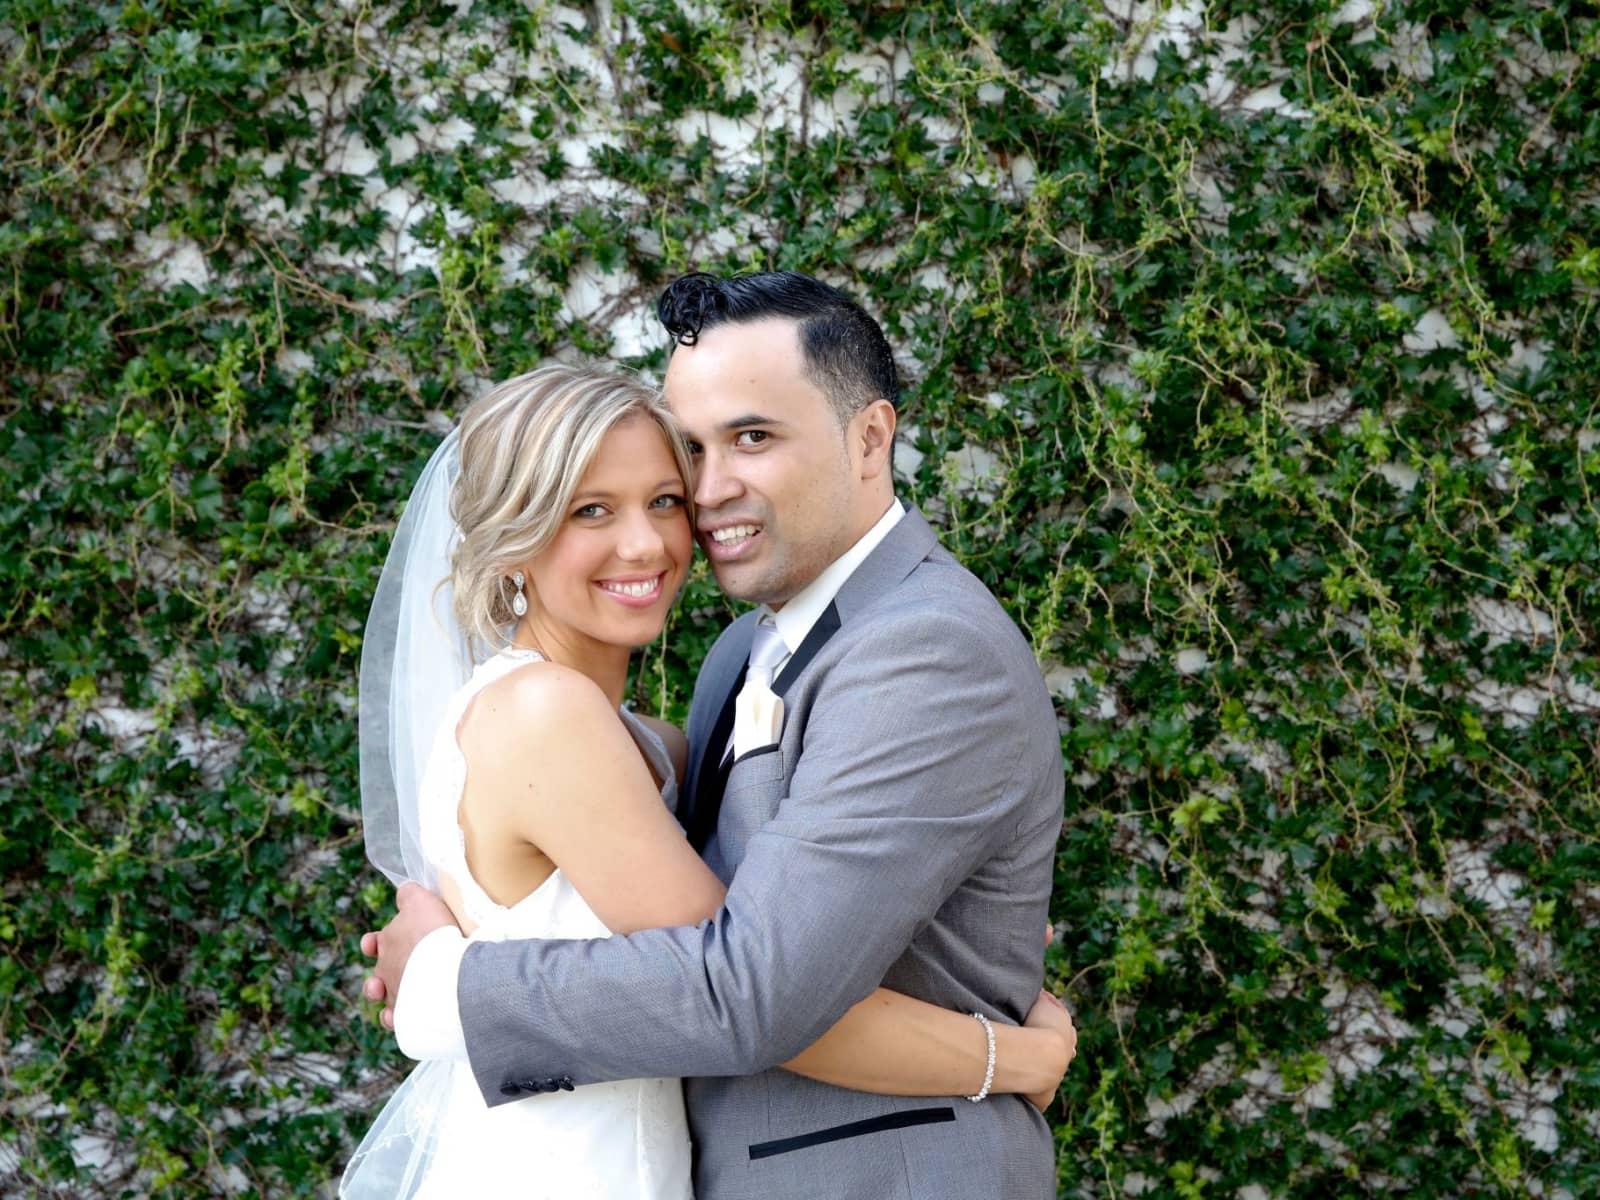 Joshua & Jessica from Toronto, Ontario, Canada